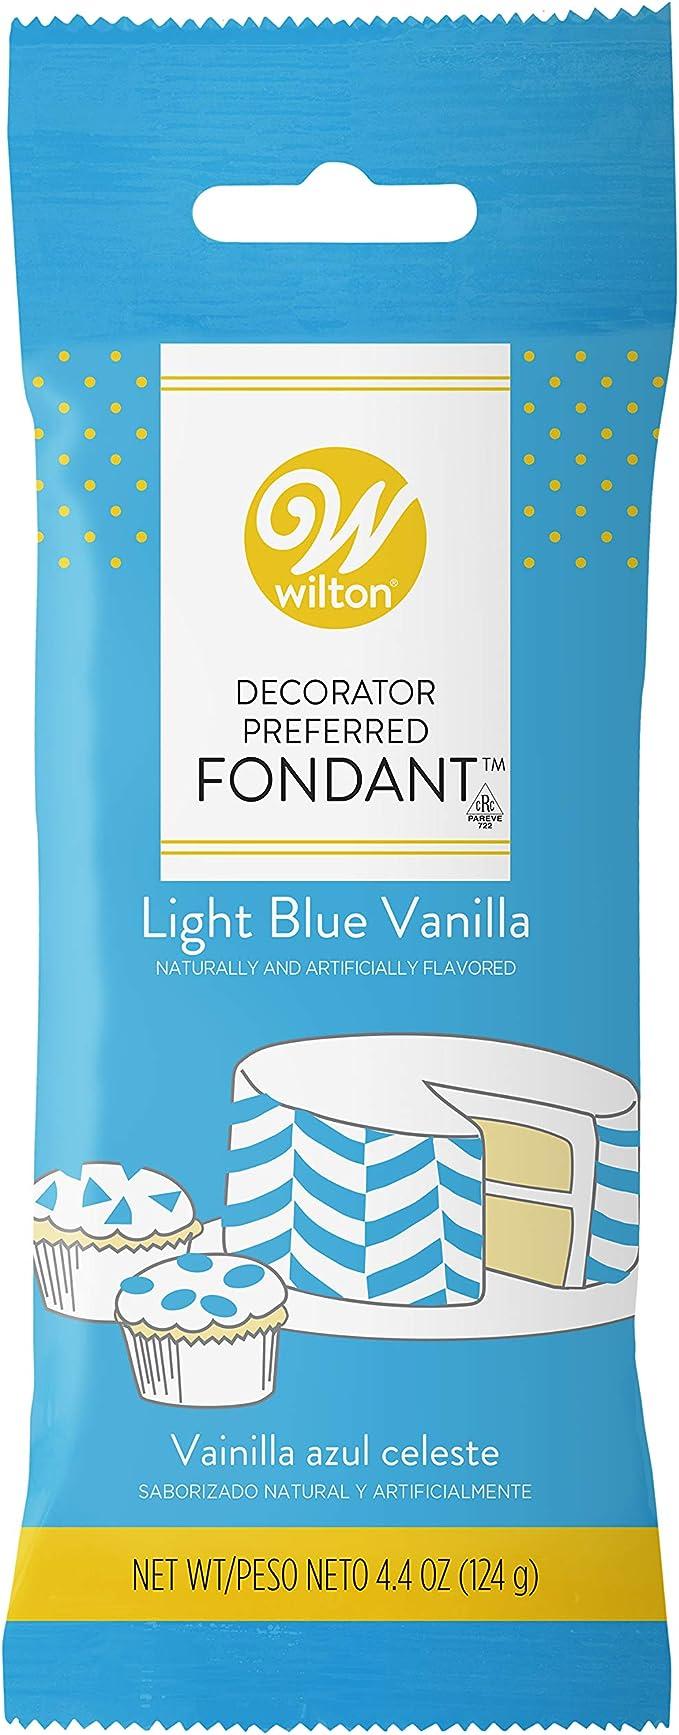 Blue Wilton Decorator Preferred 250g Fondant